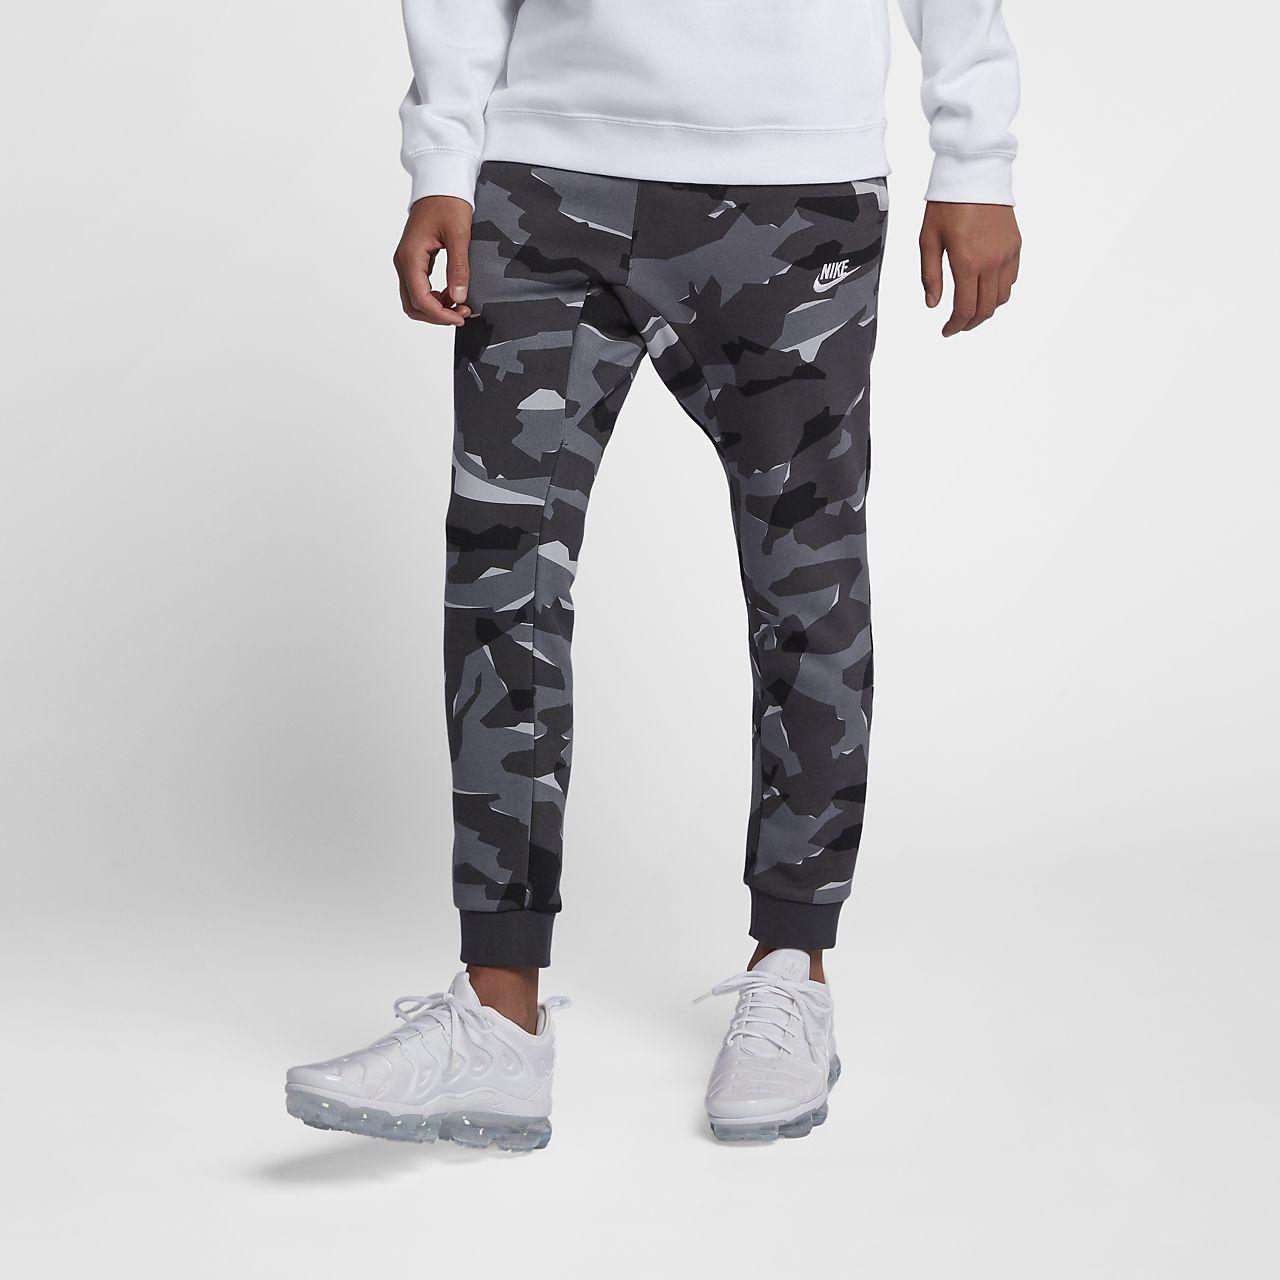 Sportswear Homme Camouflage Pour Pantalon Nike Jogging De Club xPOaBqwI